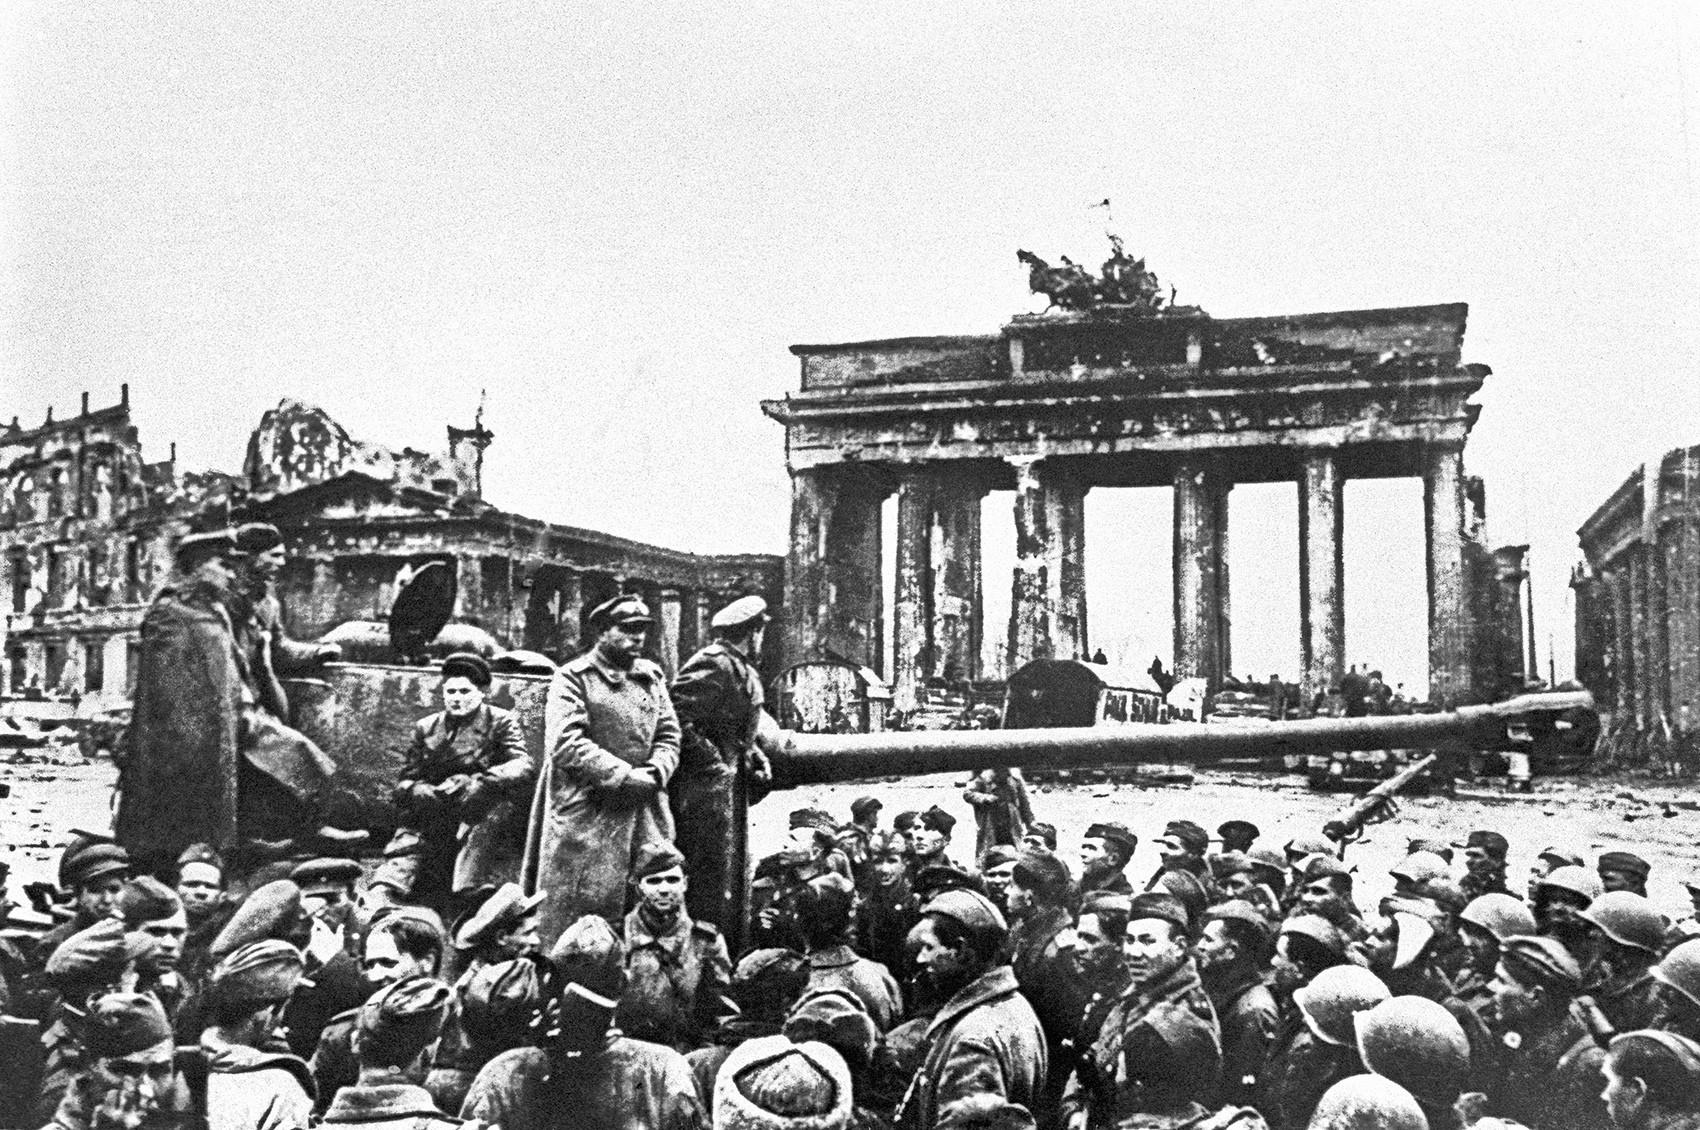 Sowjetische Truppen in Berlin im Mai 1945